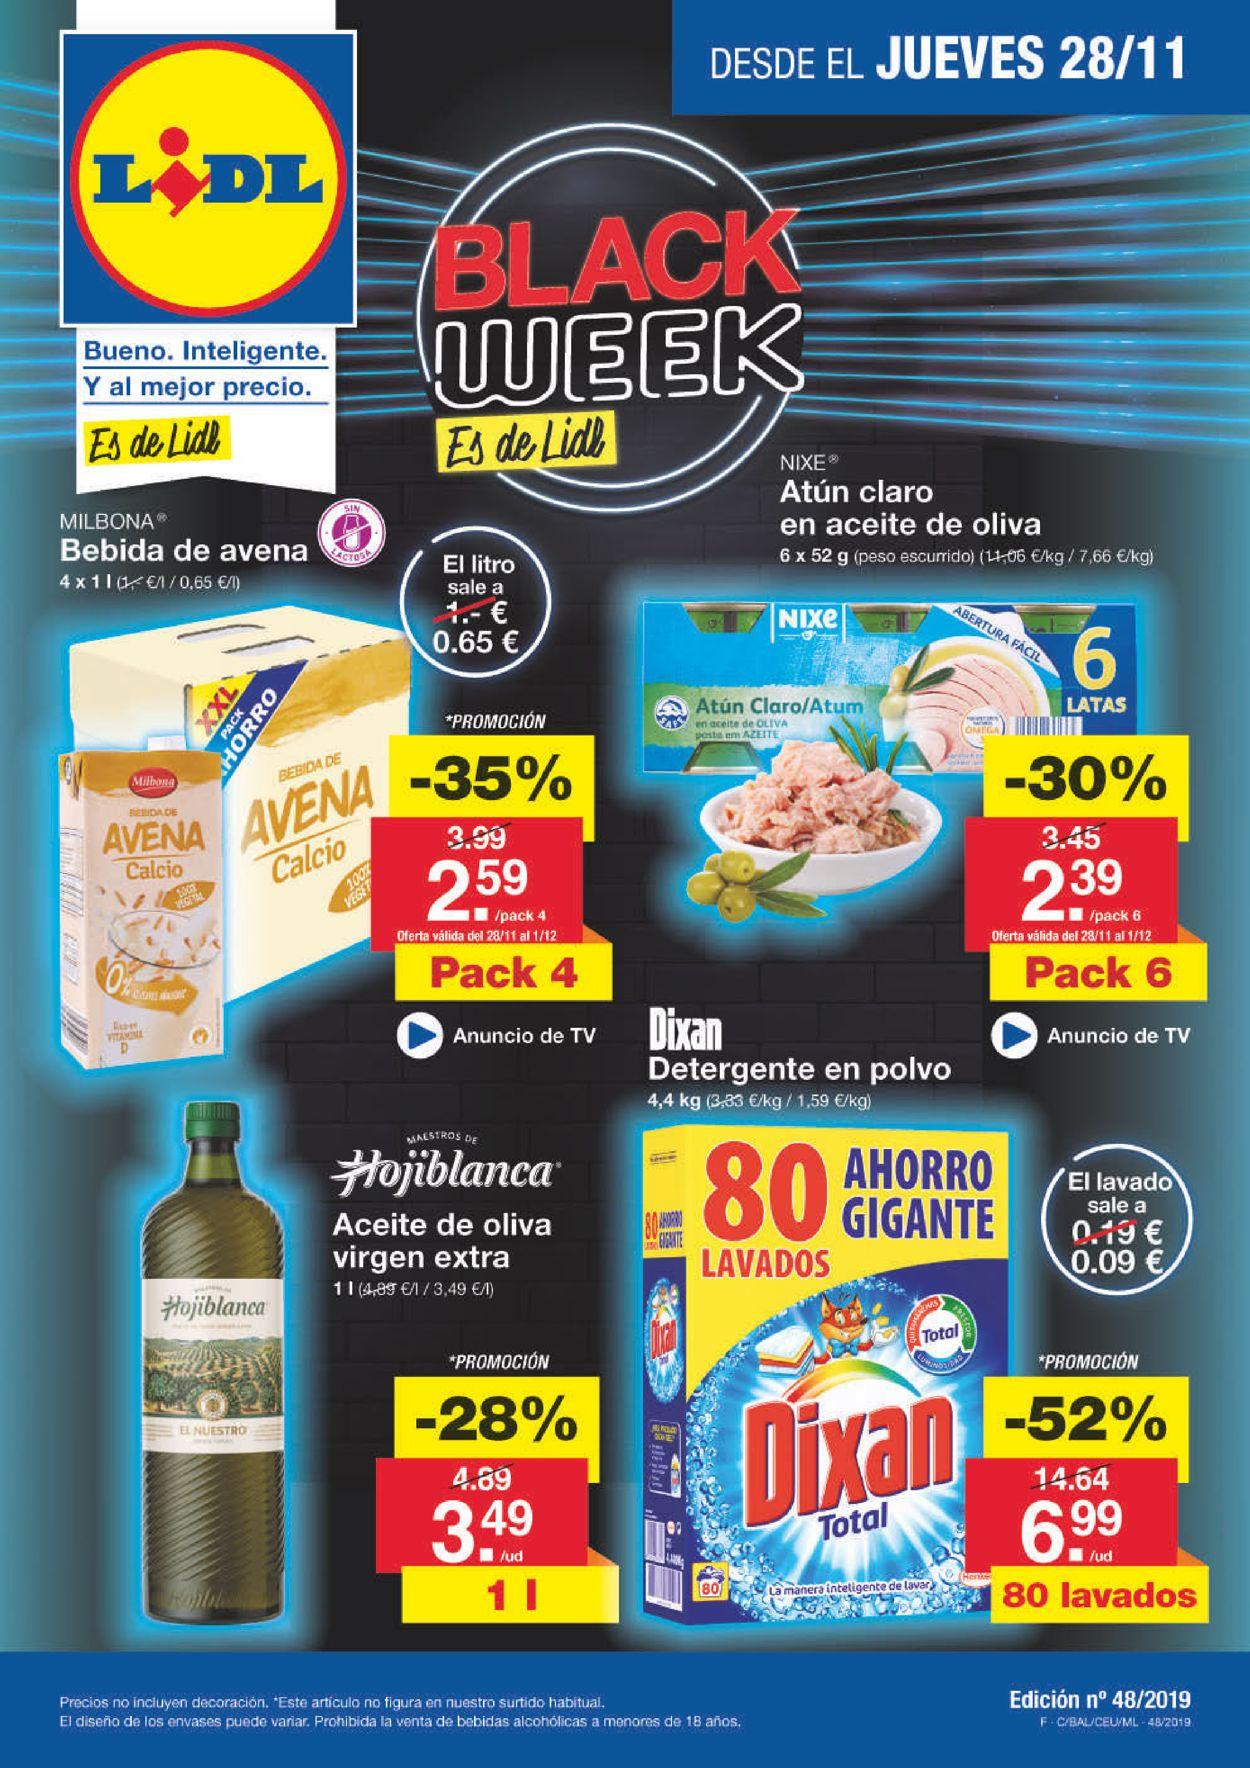 Lidl - Black Week Folleto 2019 Folleto - 28.11-04.12.2019